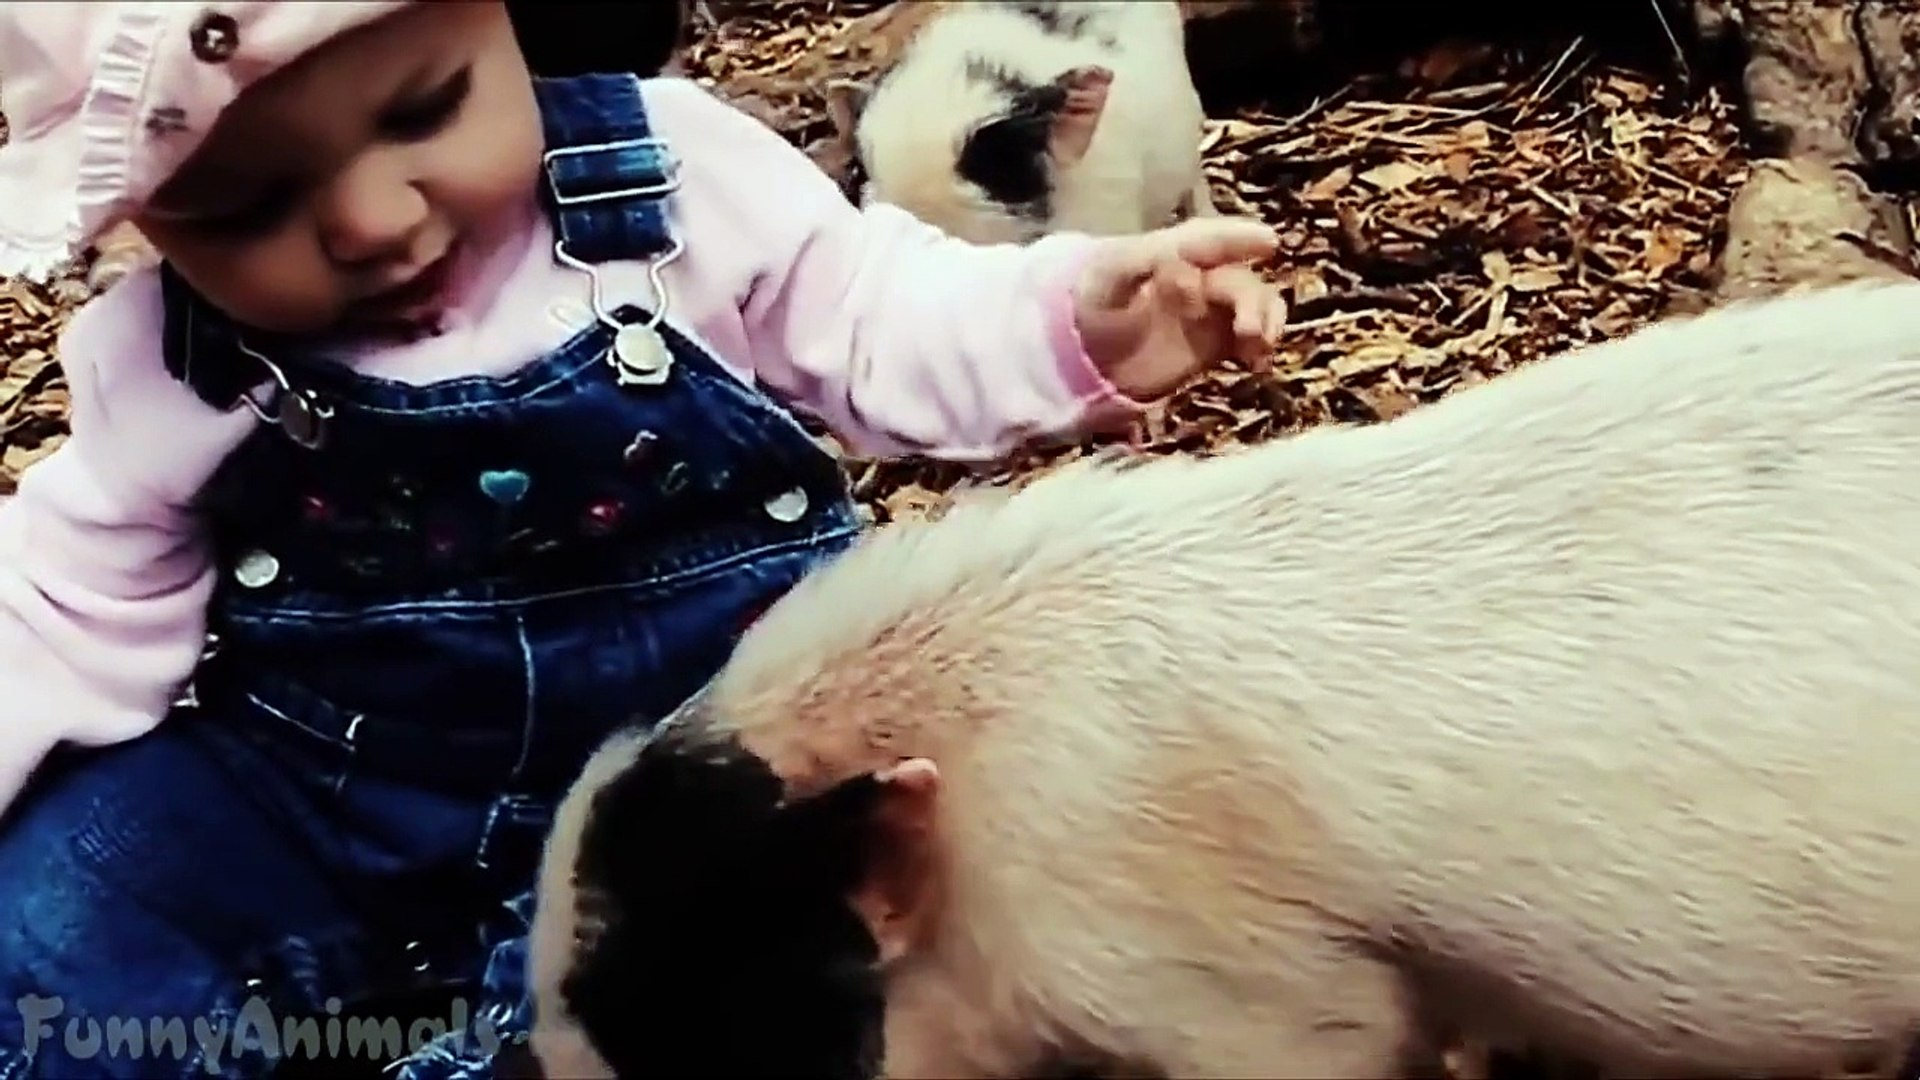 Cute Micro Pig - A Cute Mini Pig Videos Compilation - Best Mini Pig Videos